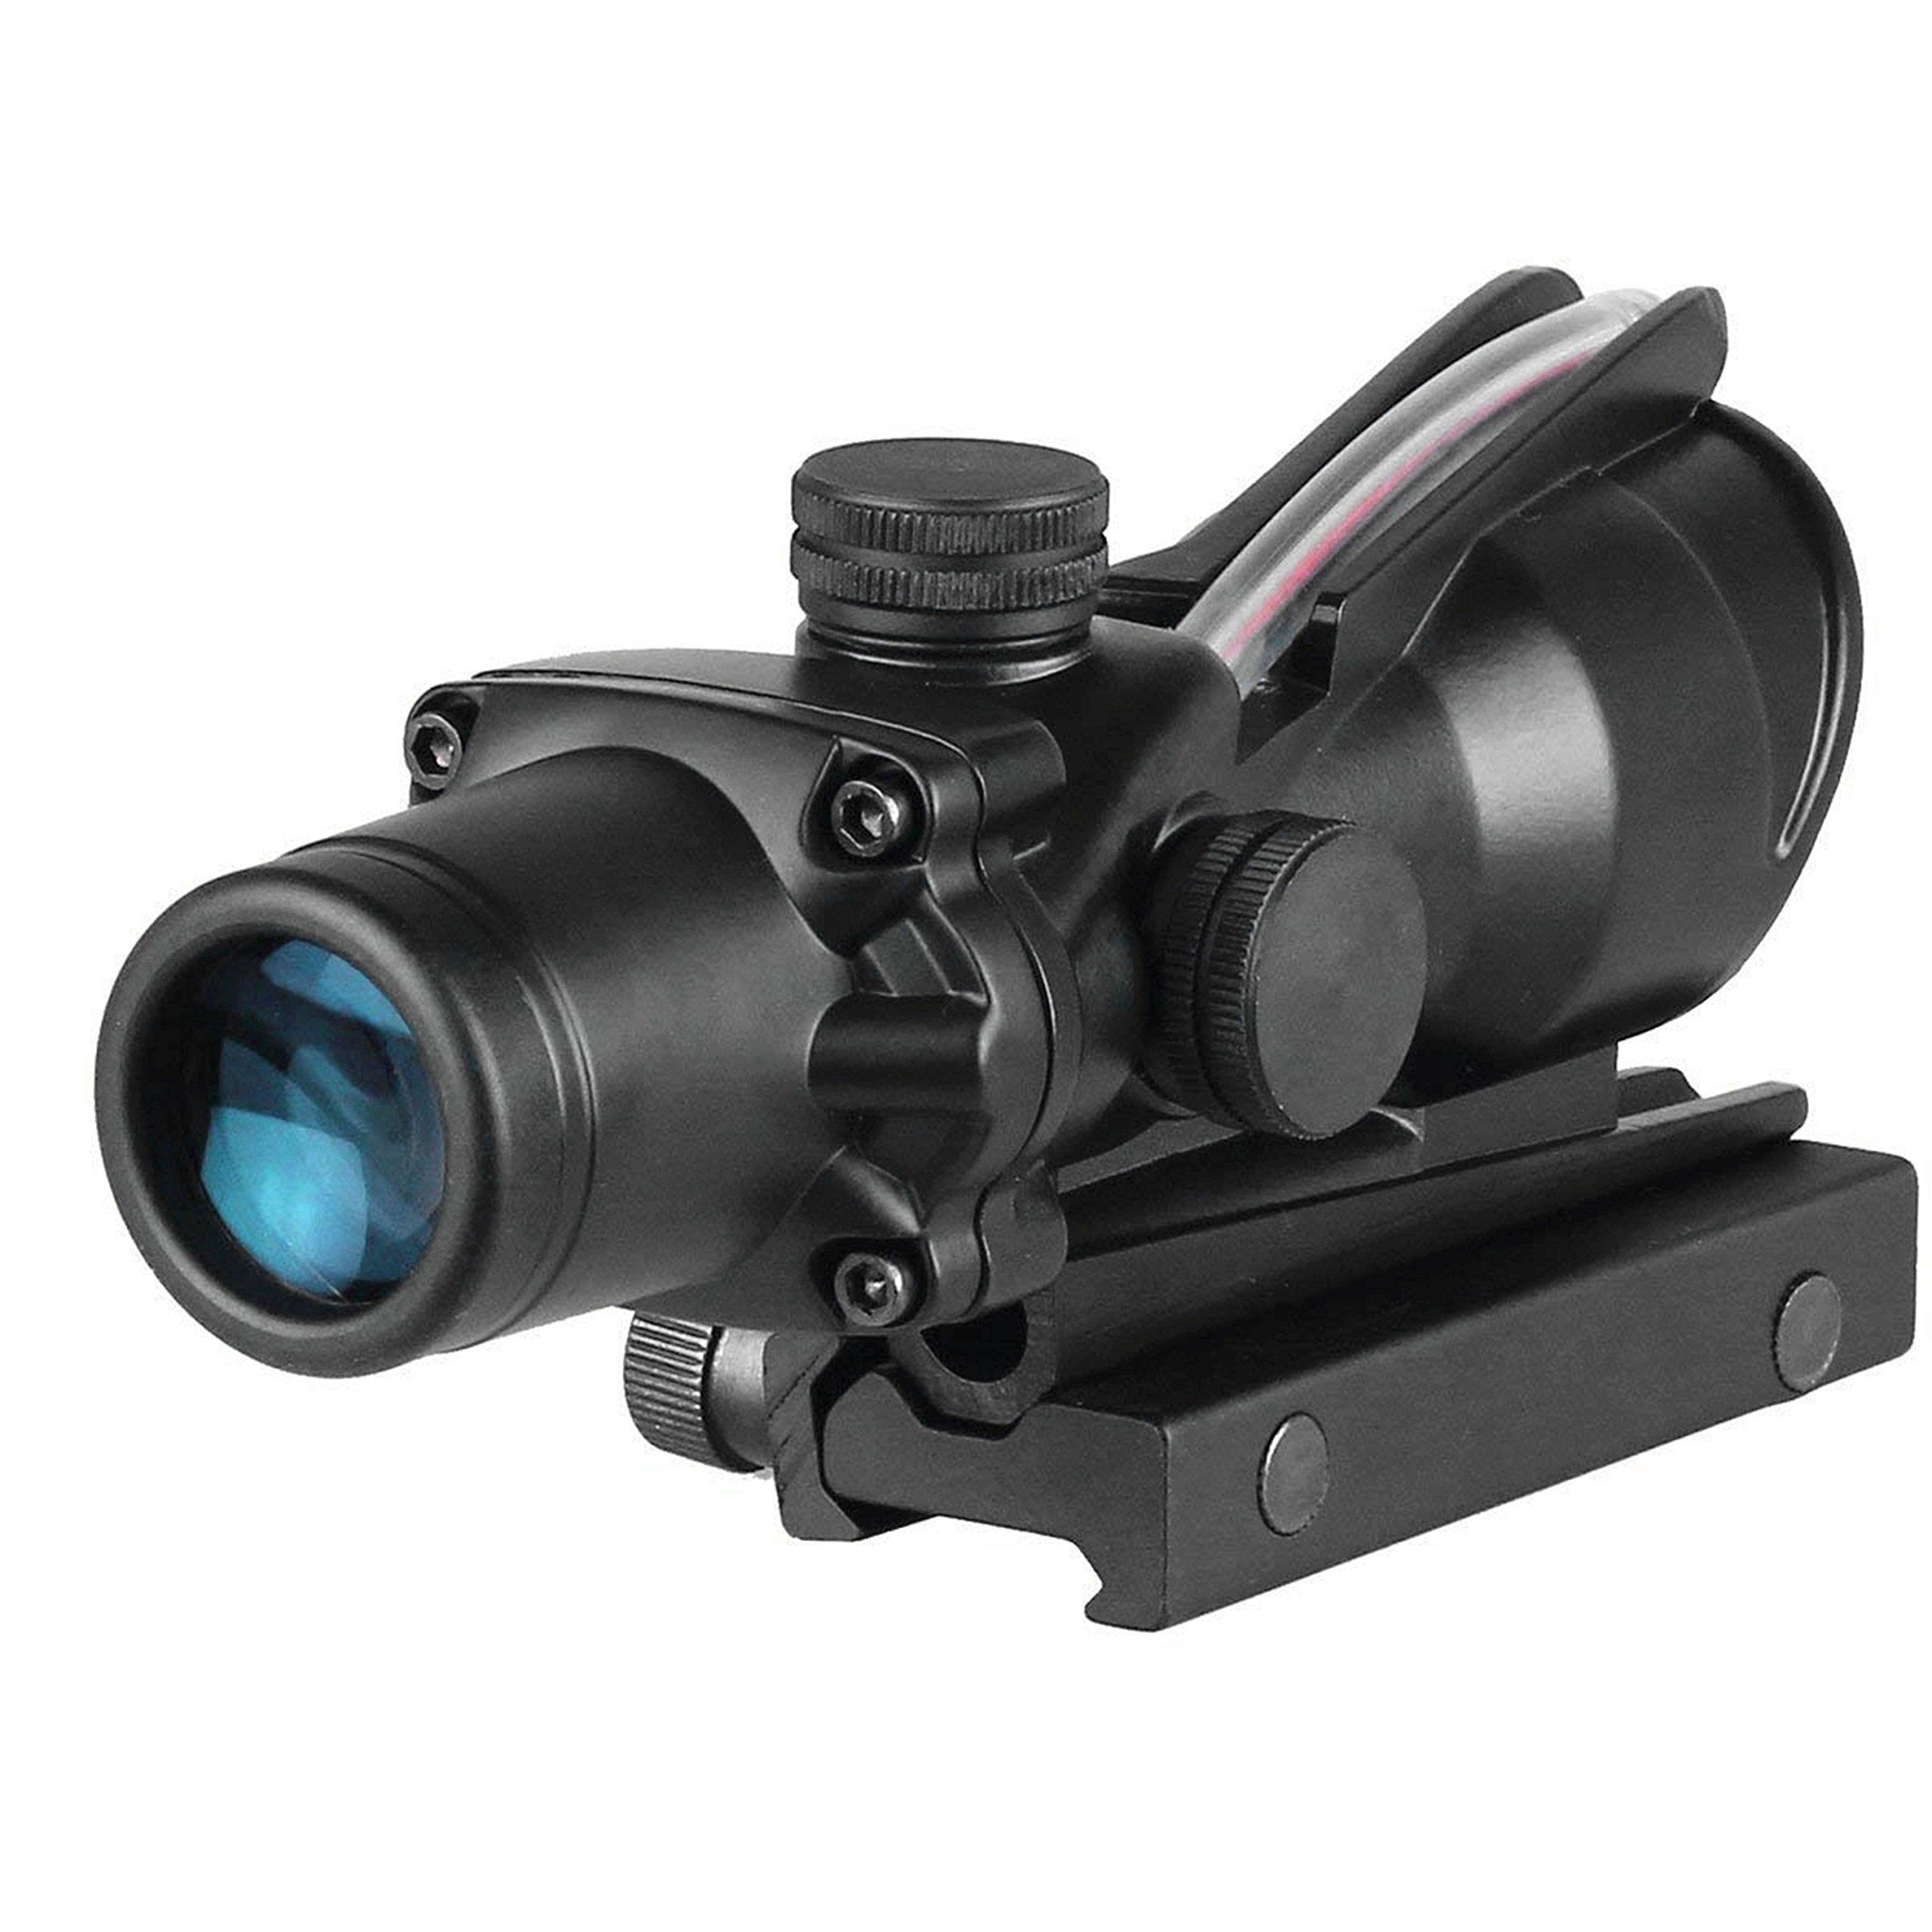 CRUSHUNT Acog 4x32 Red Fiber Scope Dual Illuminated Dot .223 Ballistic Reticle Rifle Scope